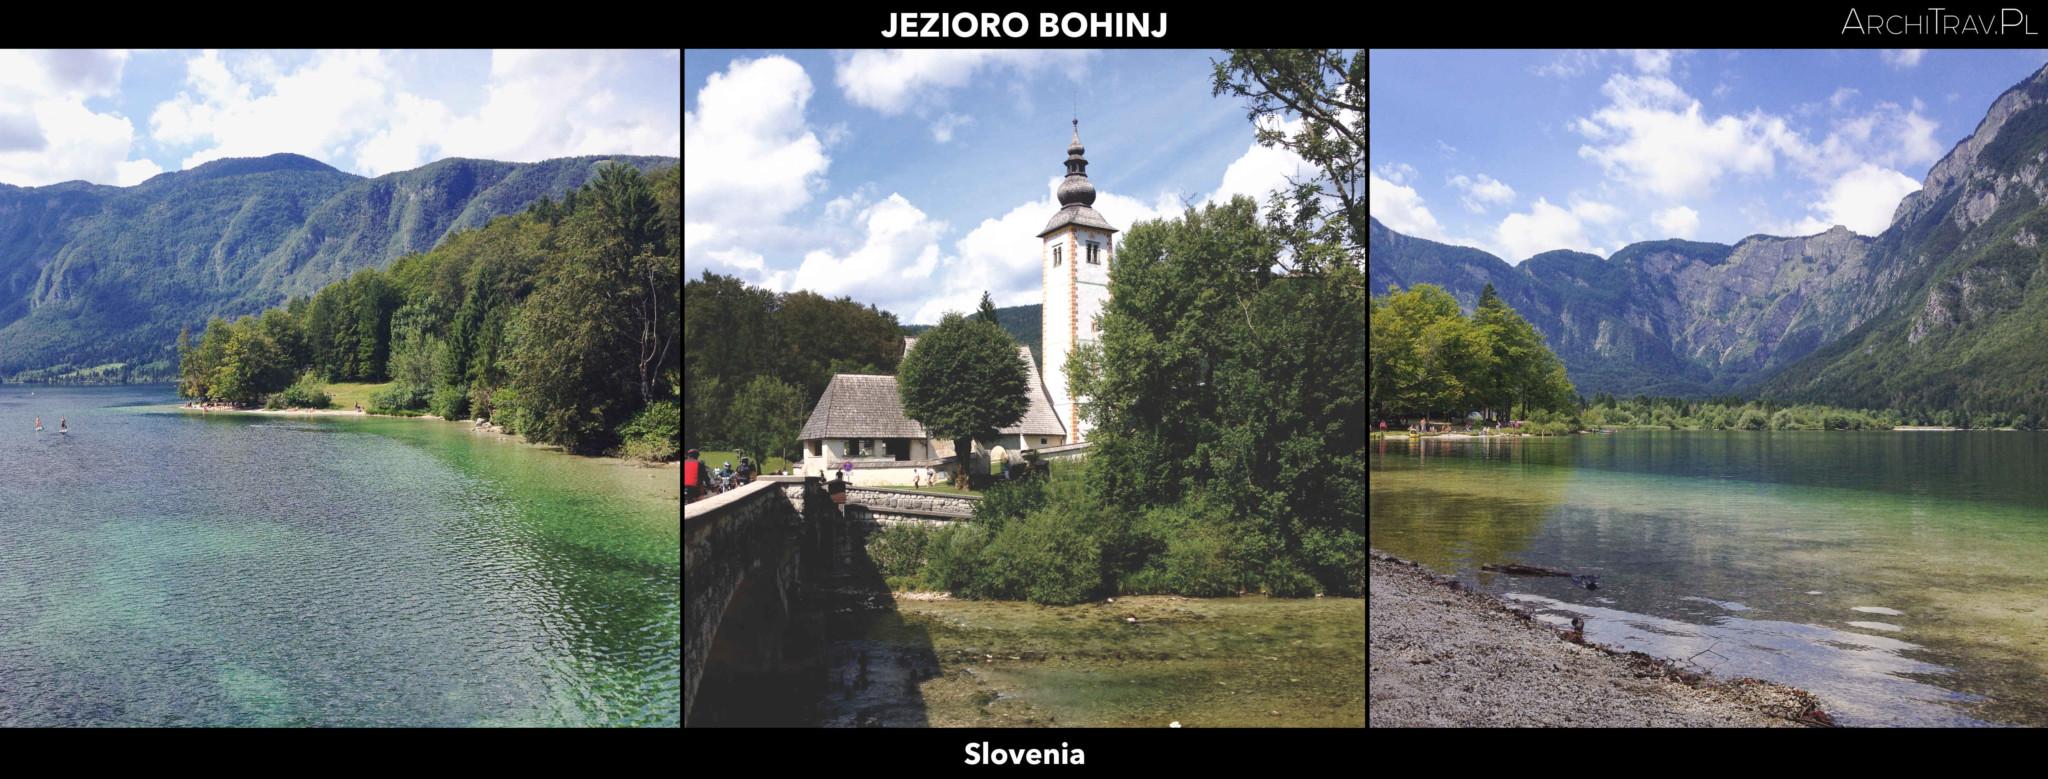 Slowenia jezioro Bohinj